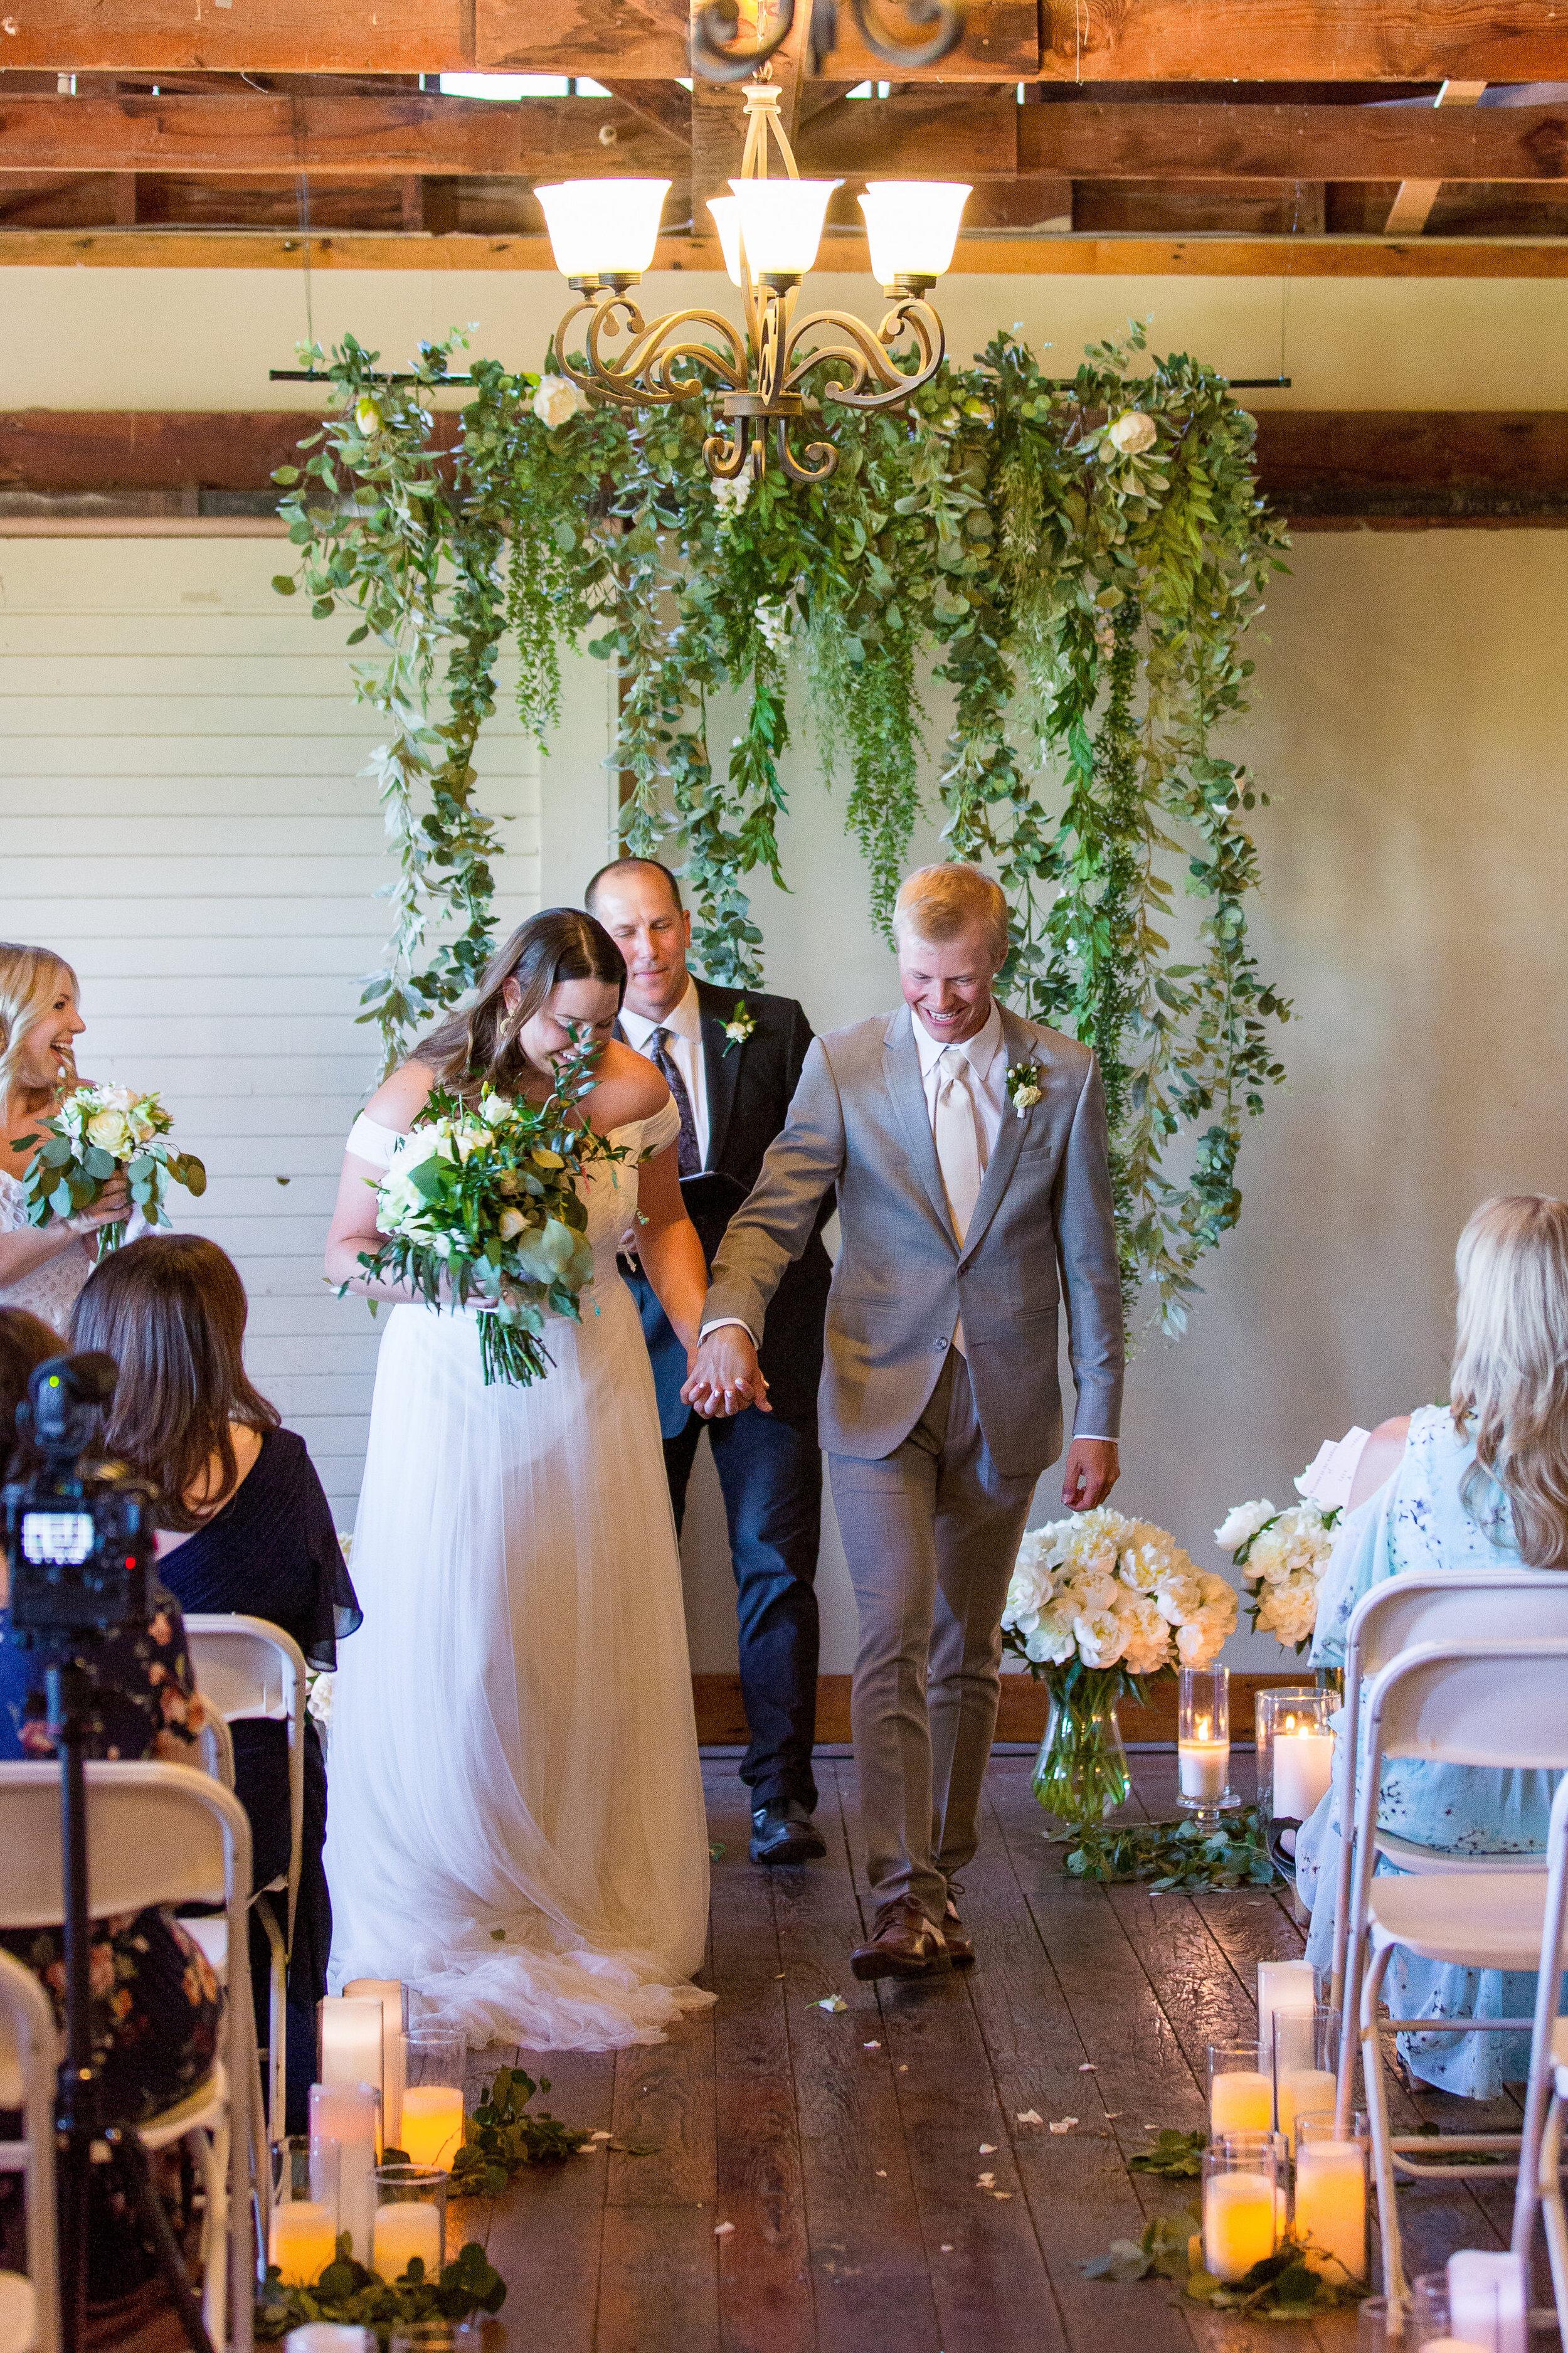 spokane bride and groom wedding ceremony